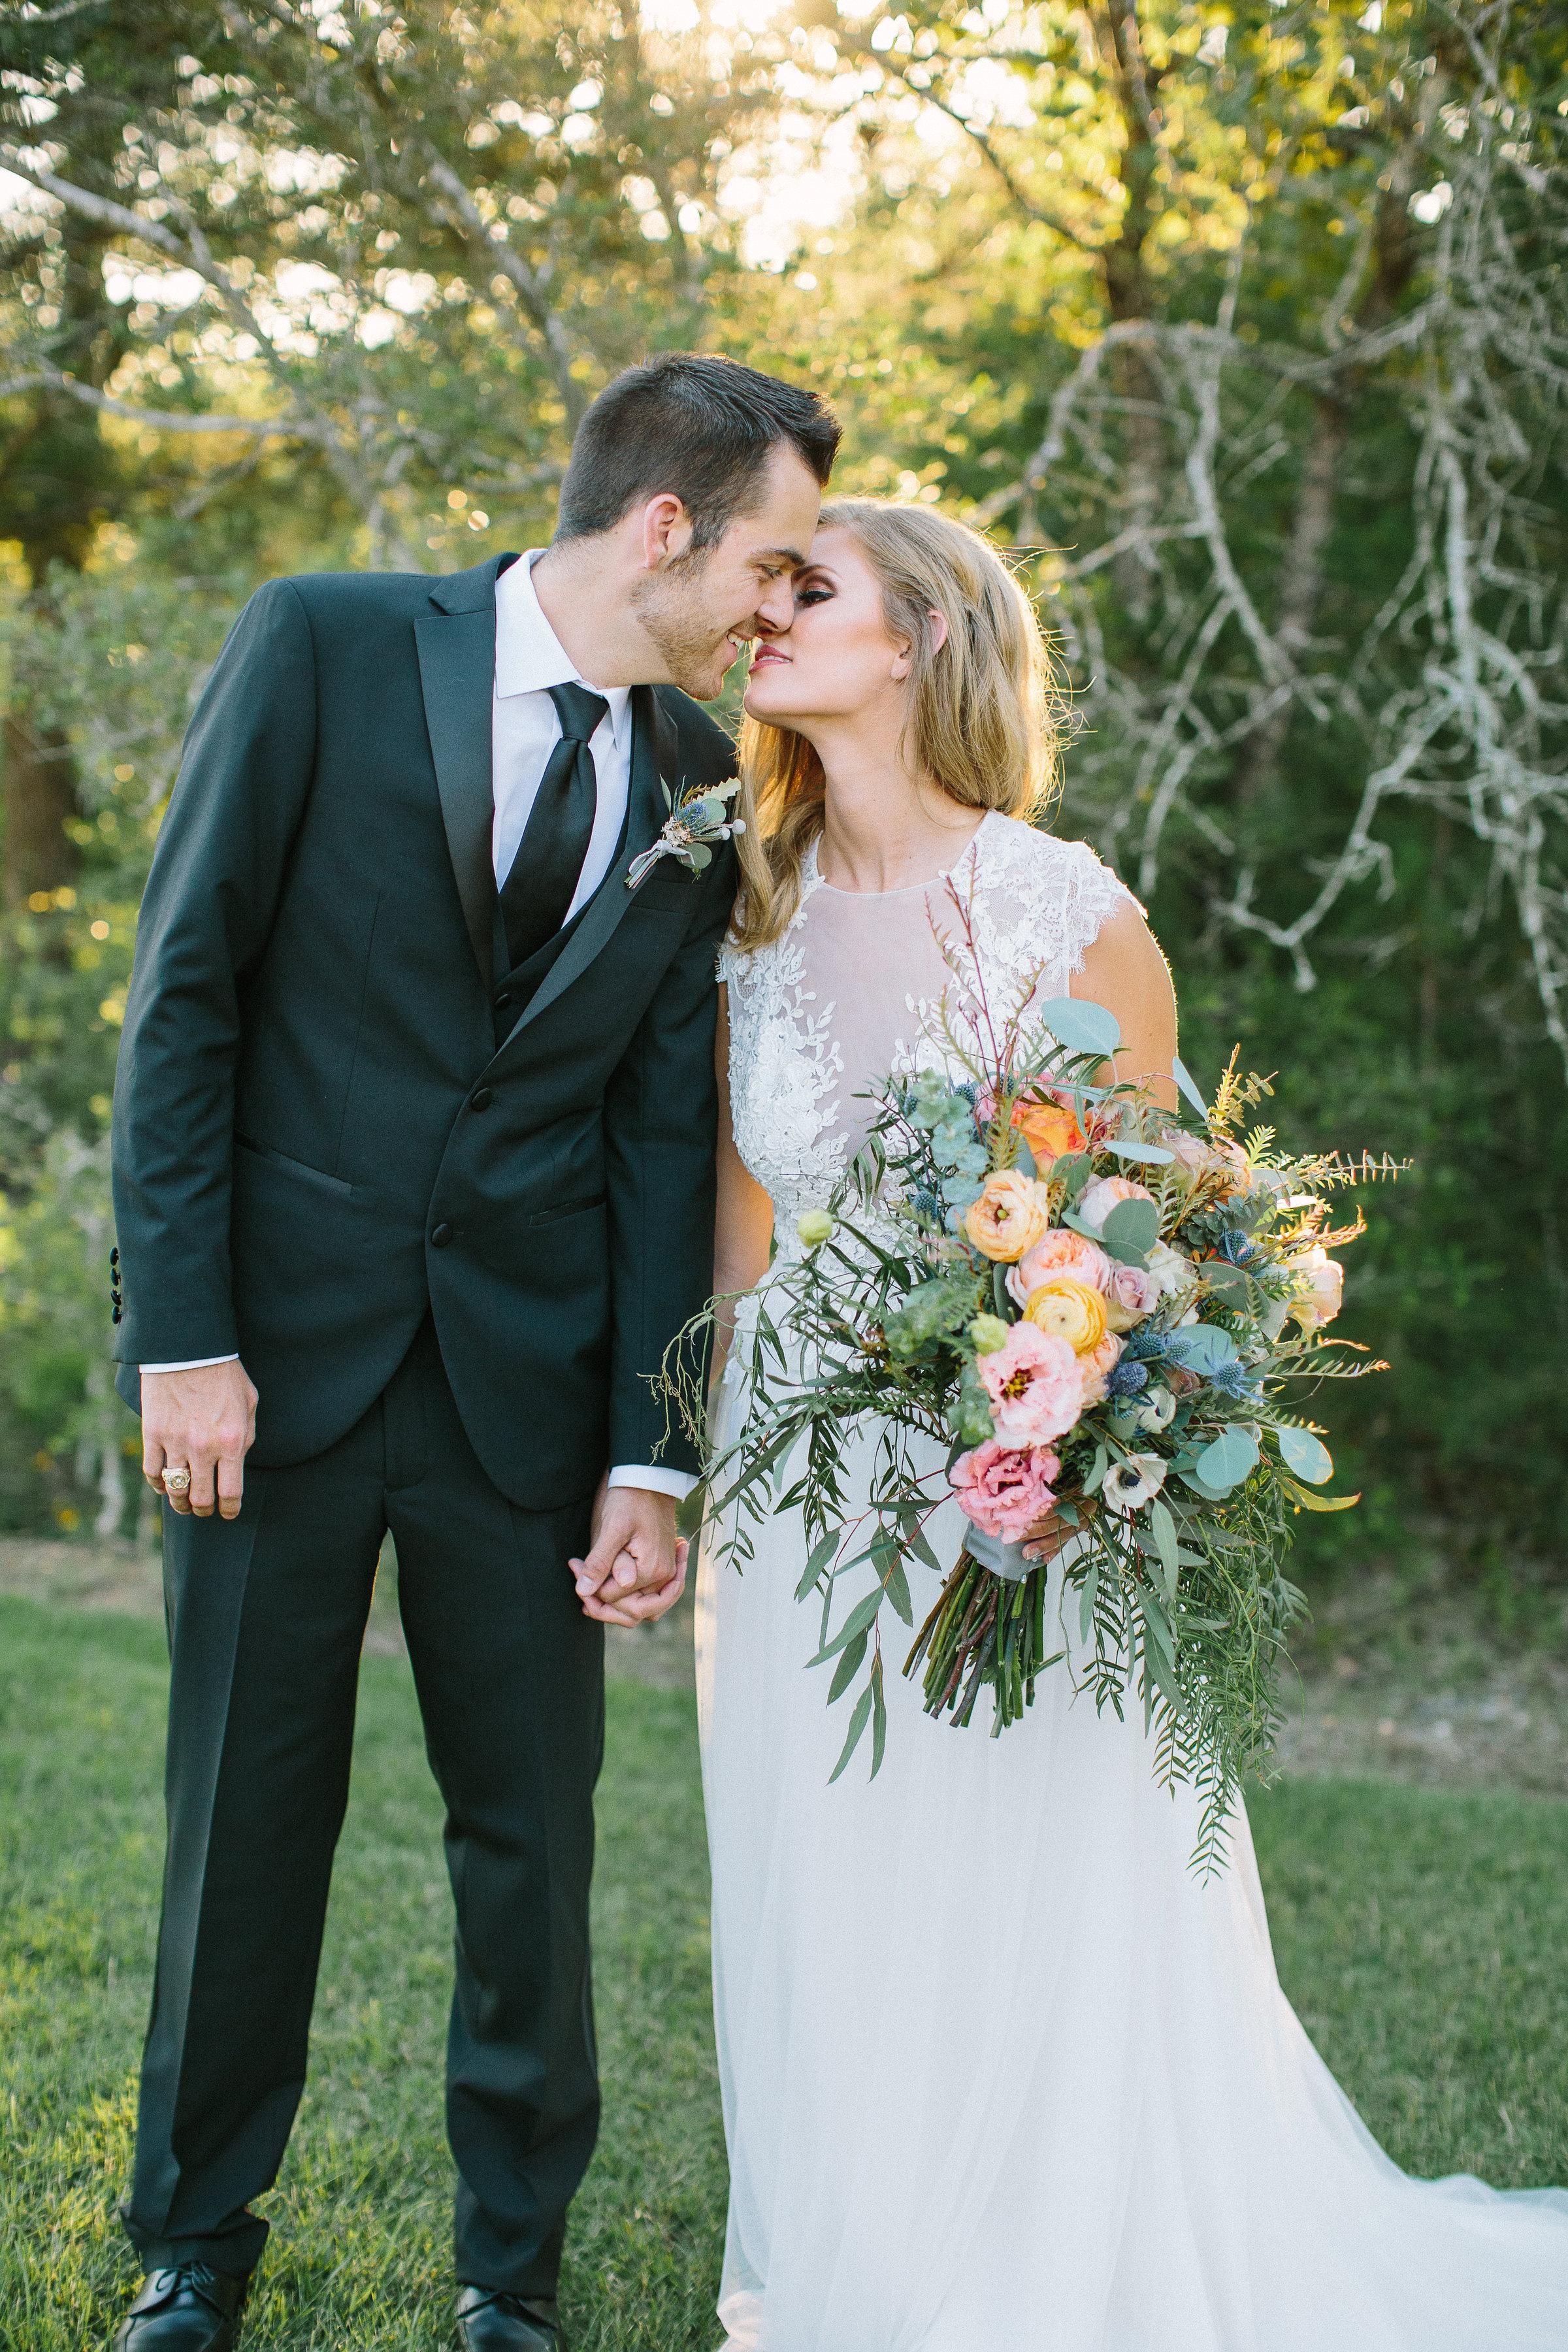 Ellen-Ashton-Photography-Peach-Creek-Ranch-Weddings-Wed-and-Prosper284